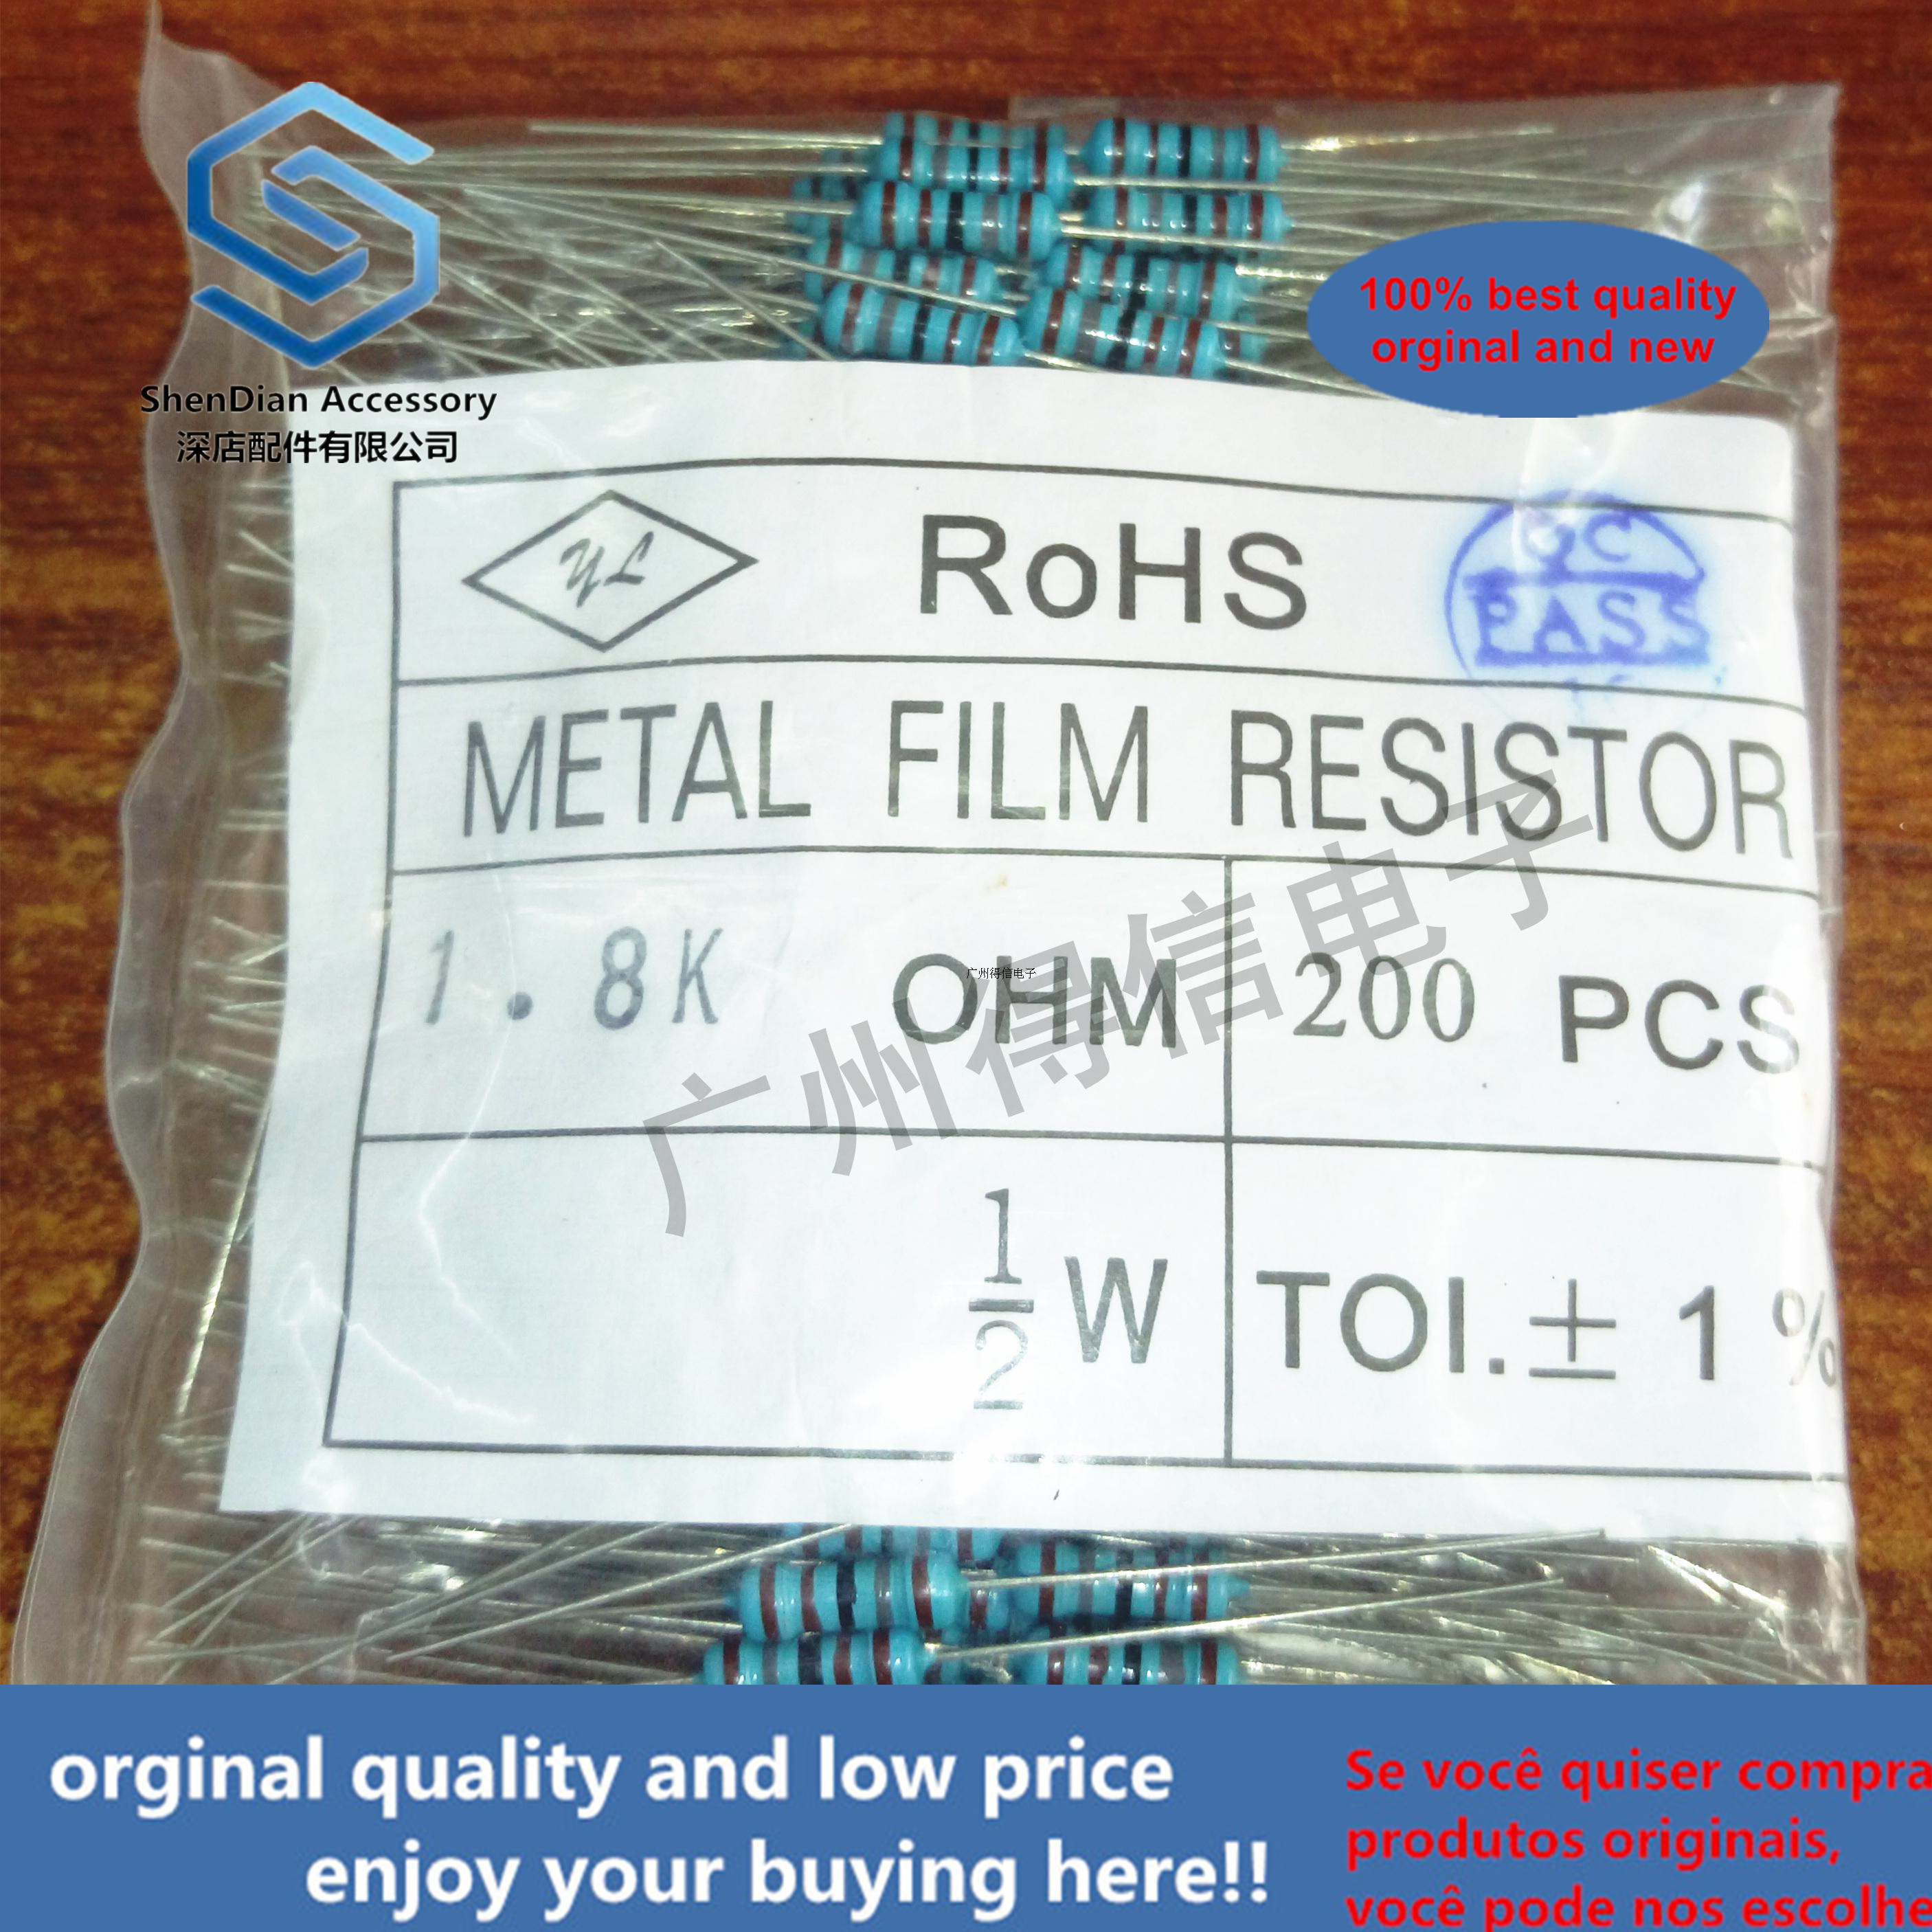 200pcs 1 / 2W 1.8M 1% Brand New Metal Film Iron Feet Resistance Bag Pack 200 Pcs